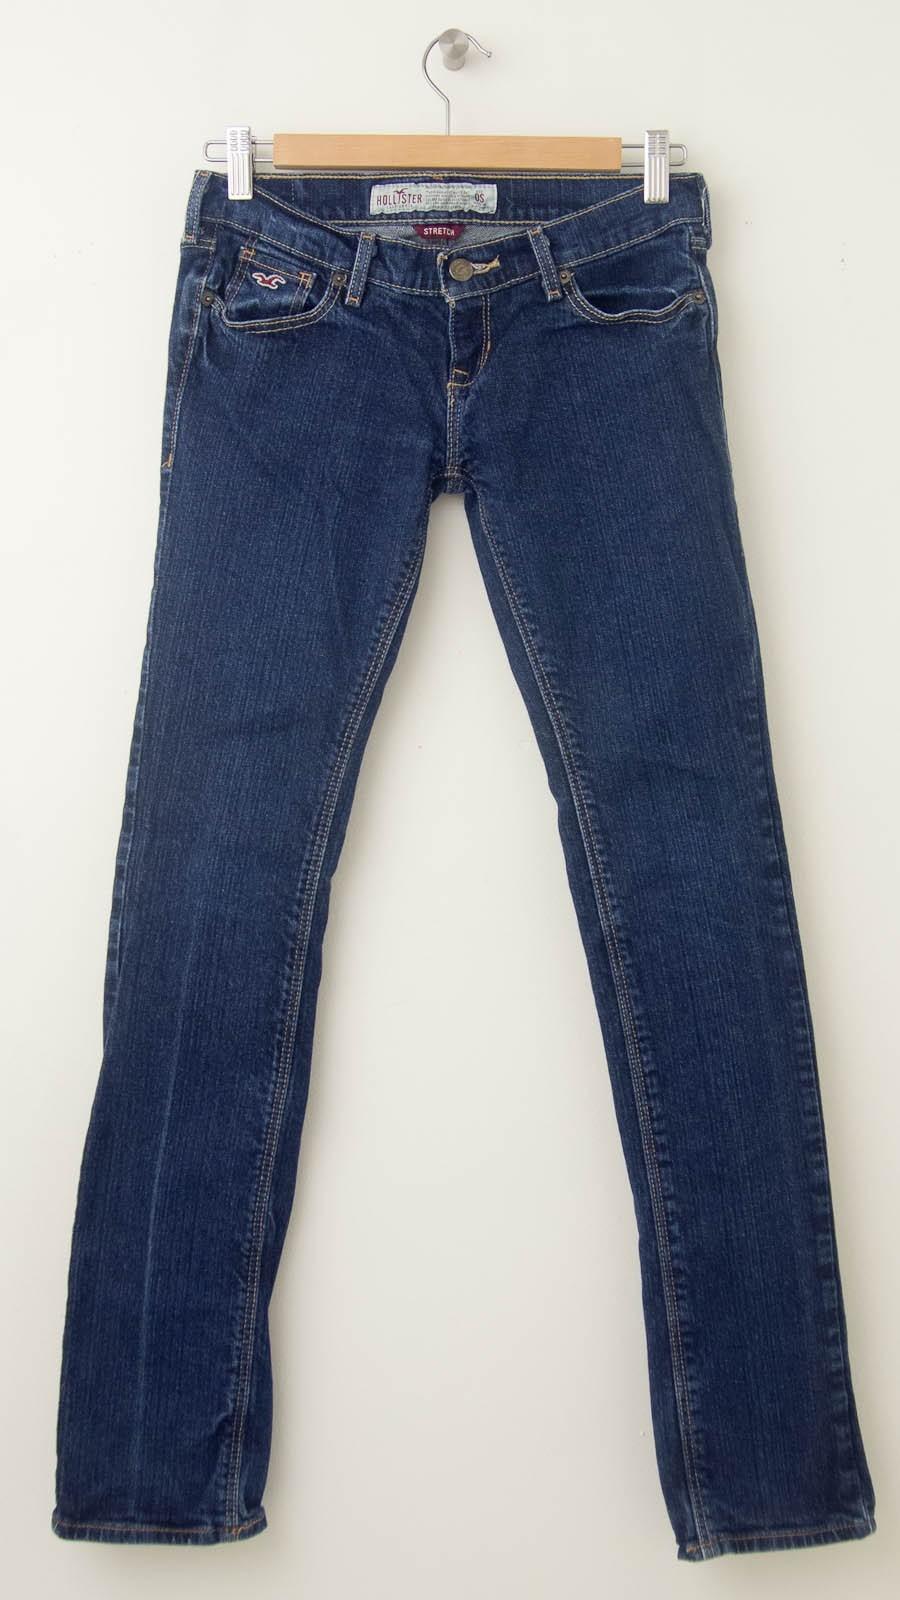 Hollister Jeans Womens